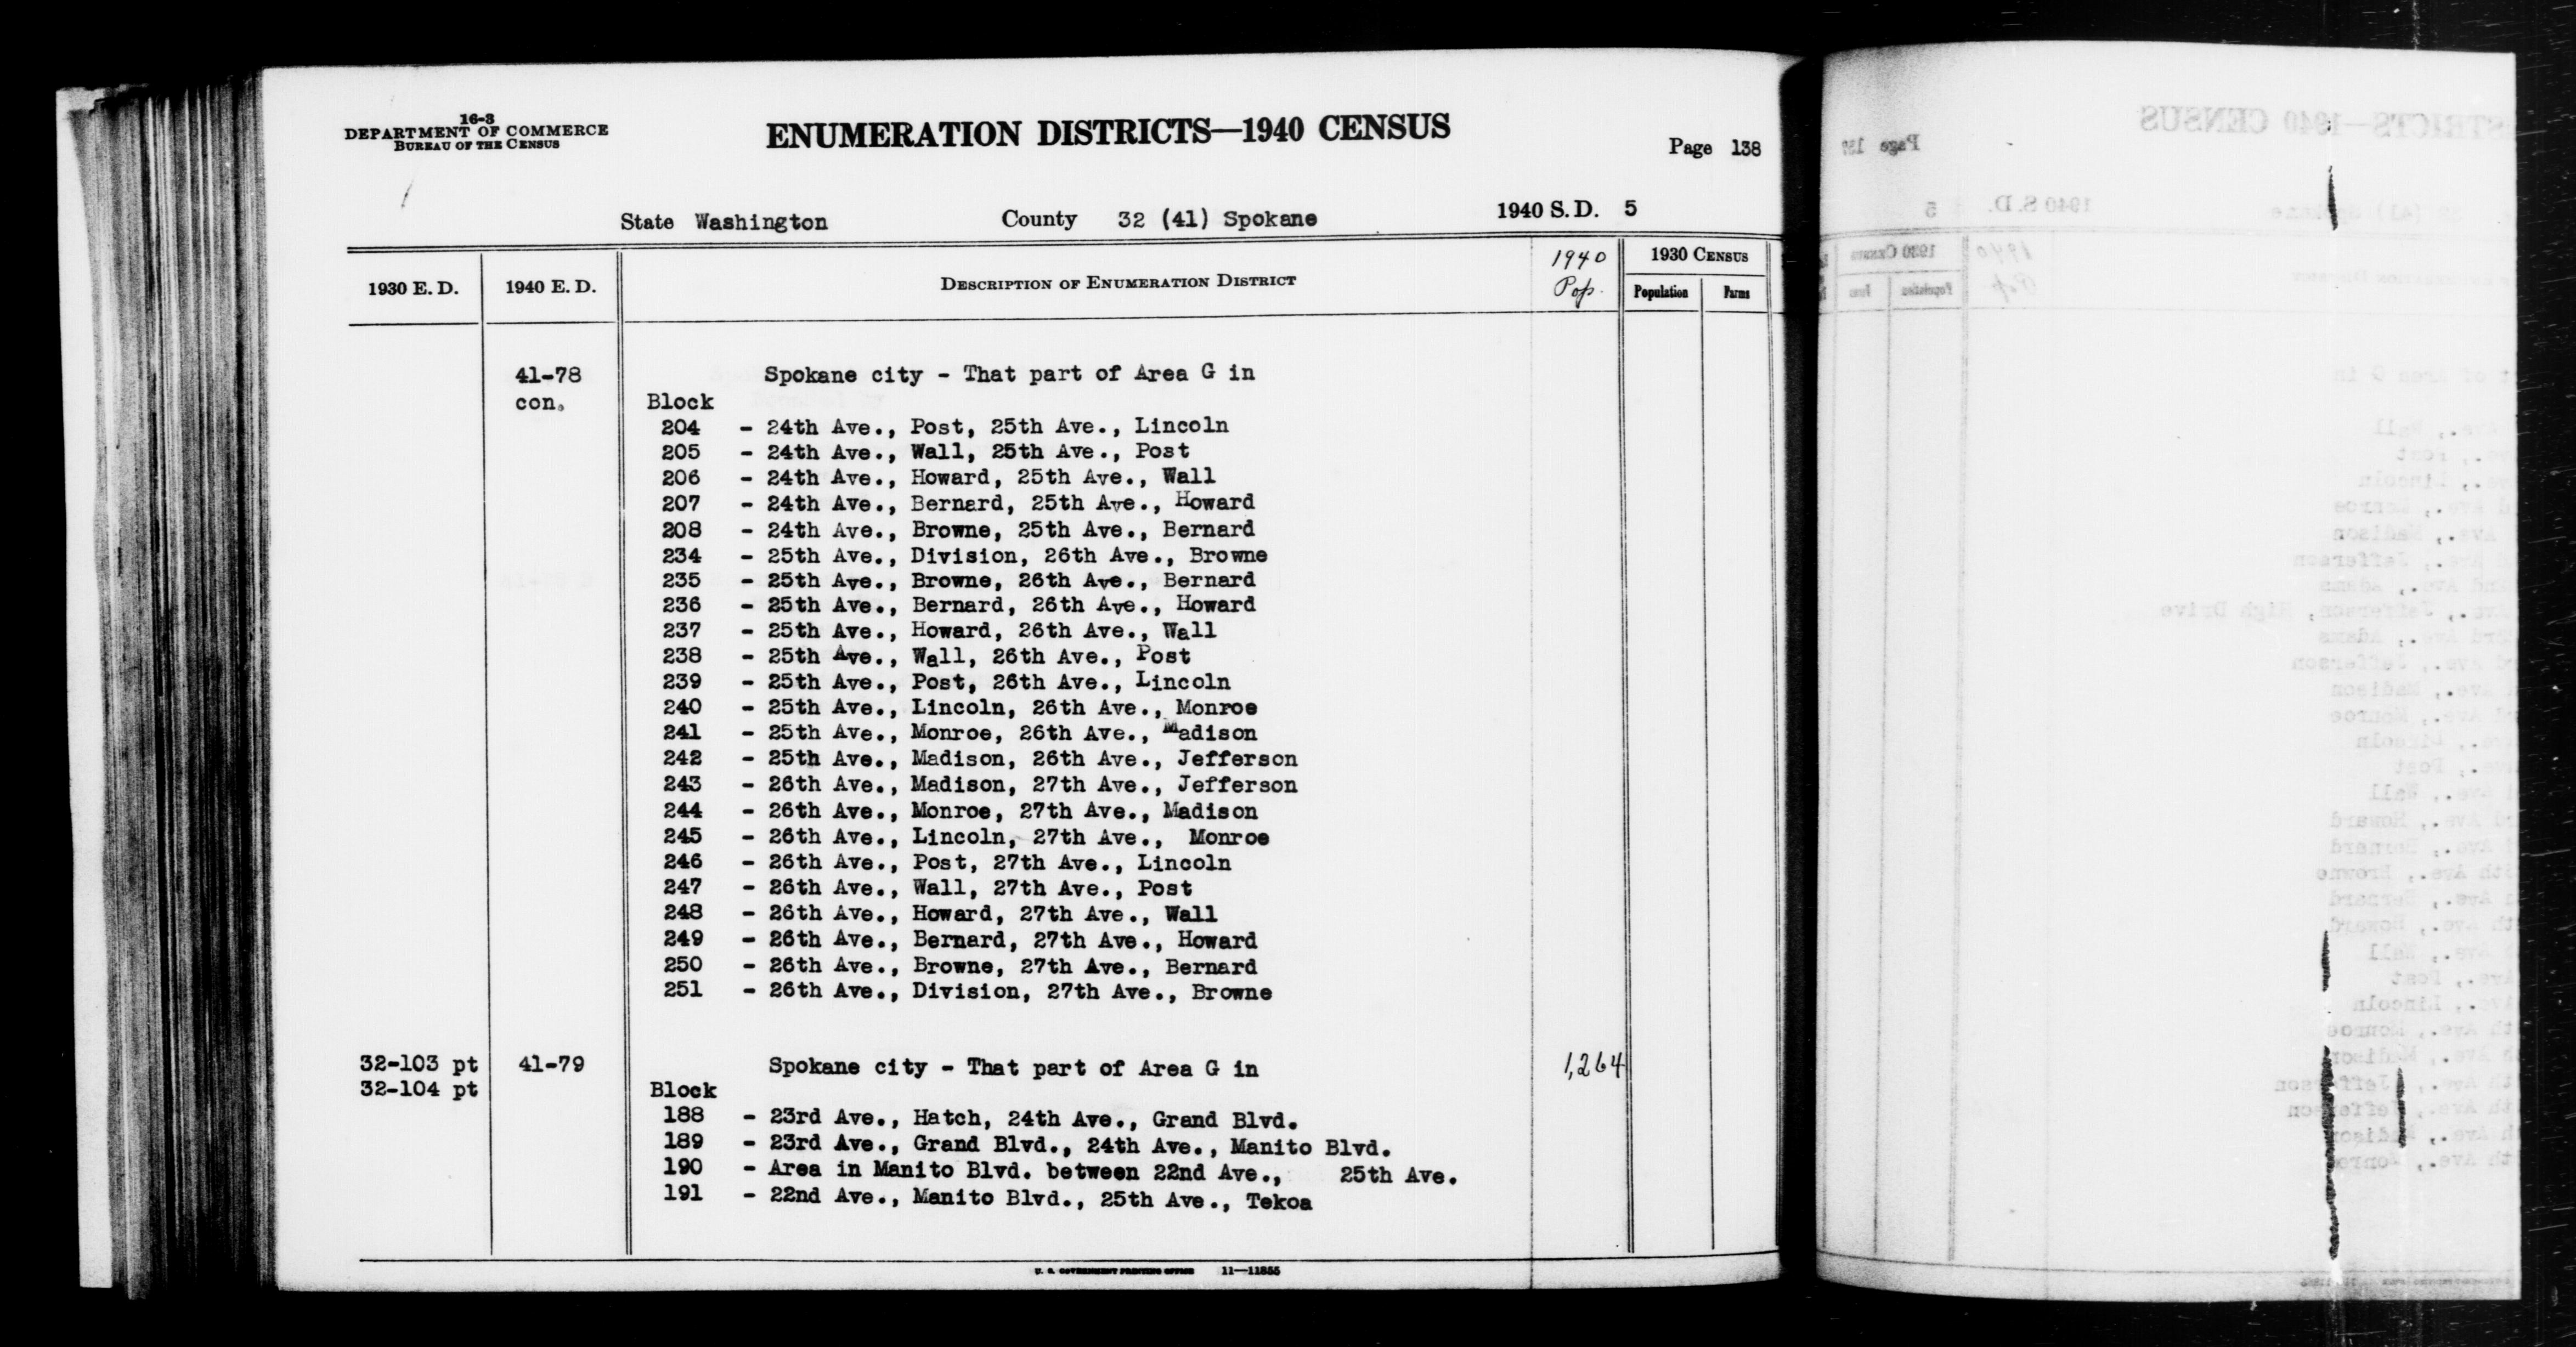 1940 Census Enumeration District Descriptions - Washington - Spokane County - ED 41-78A, ED 41-78B, ED 41-79